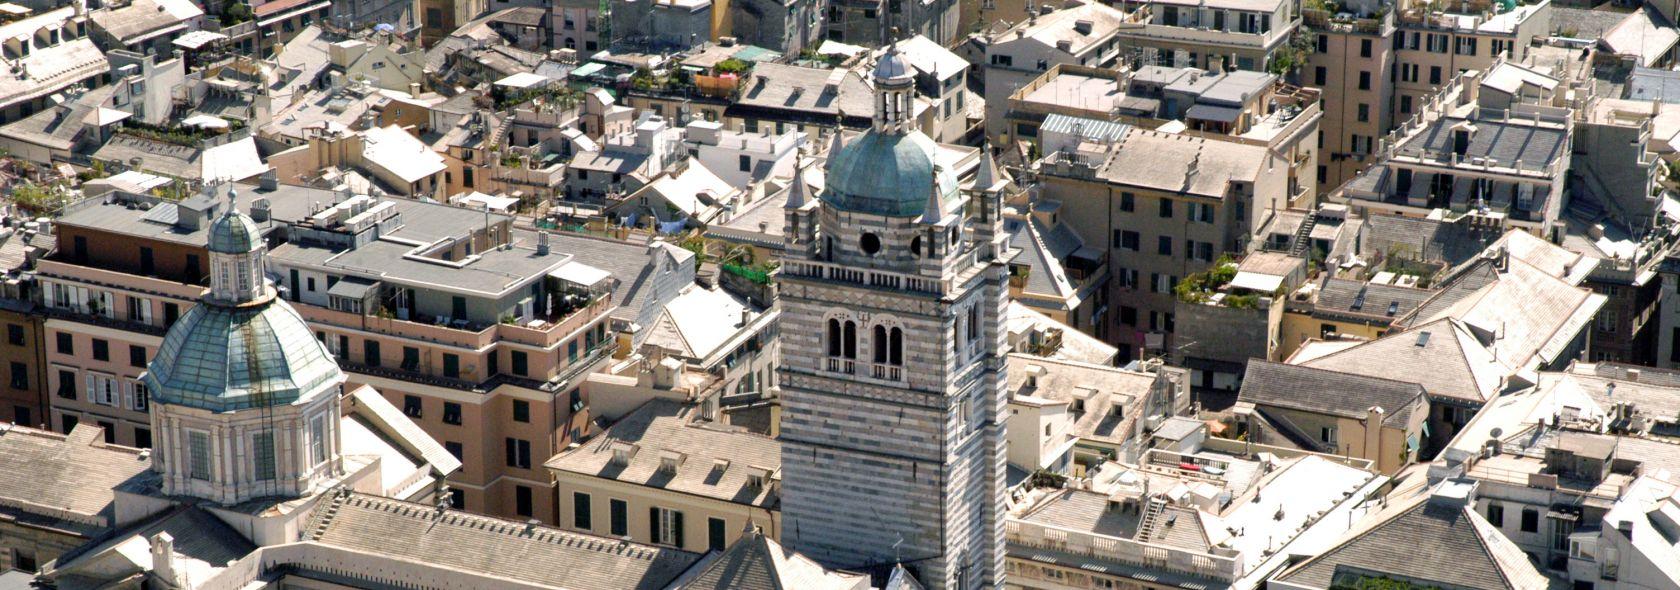 Cattedrale di San Lorenzo: panoramica